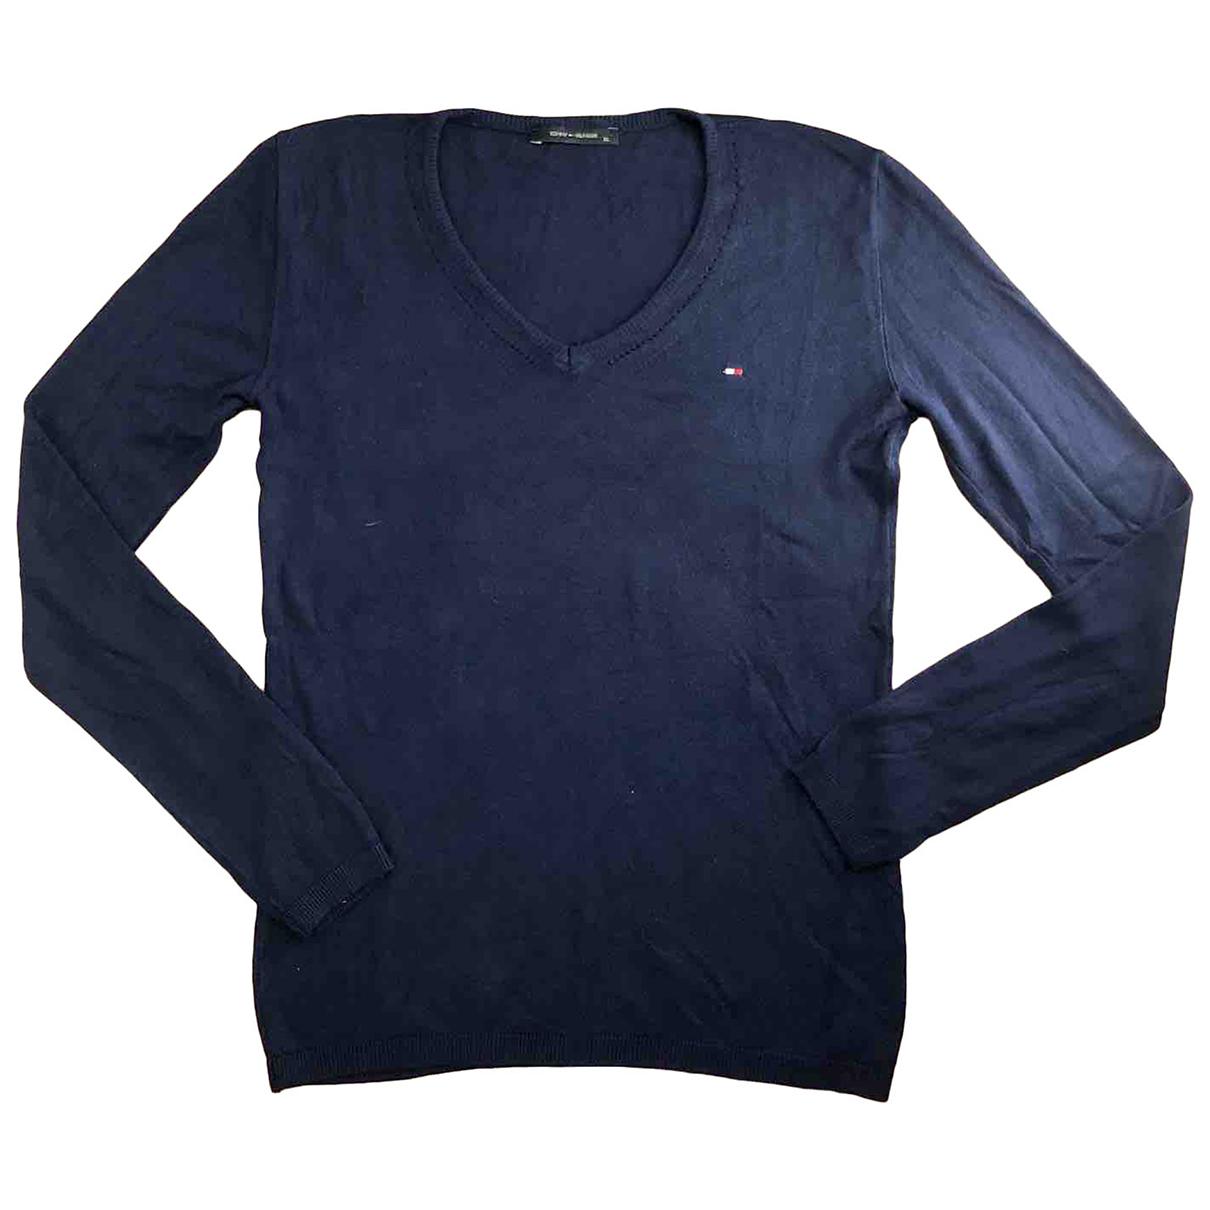 Tommy Hilfiger N Blue Cotton Knitwear for Women XL International